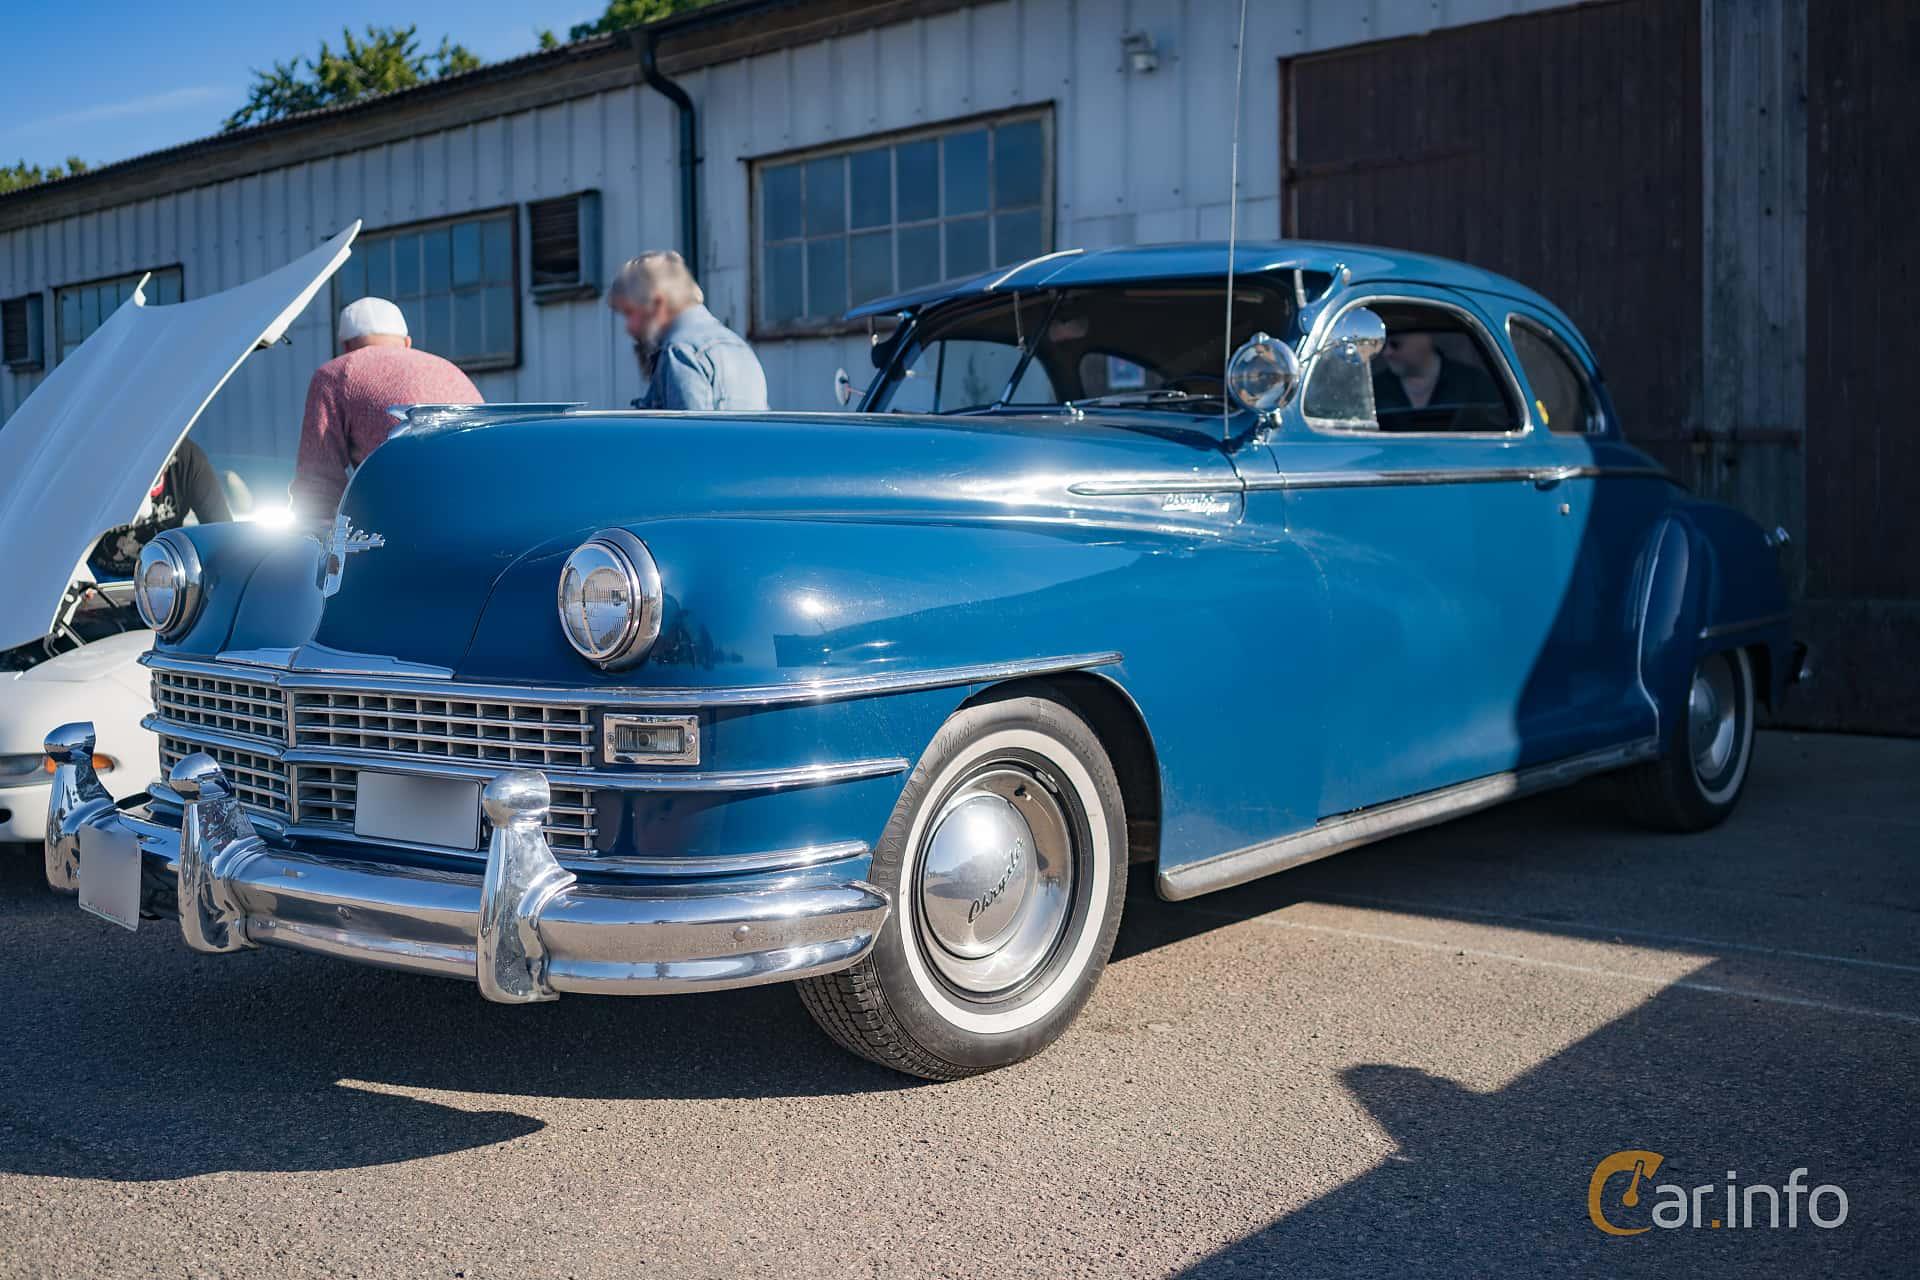 Chrysler New Yorker Club Coupé 5.3 Semi-Automatic, 137hp, 1947 at Onsdagsträffar i Höganäs (Juli 2017)